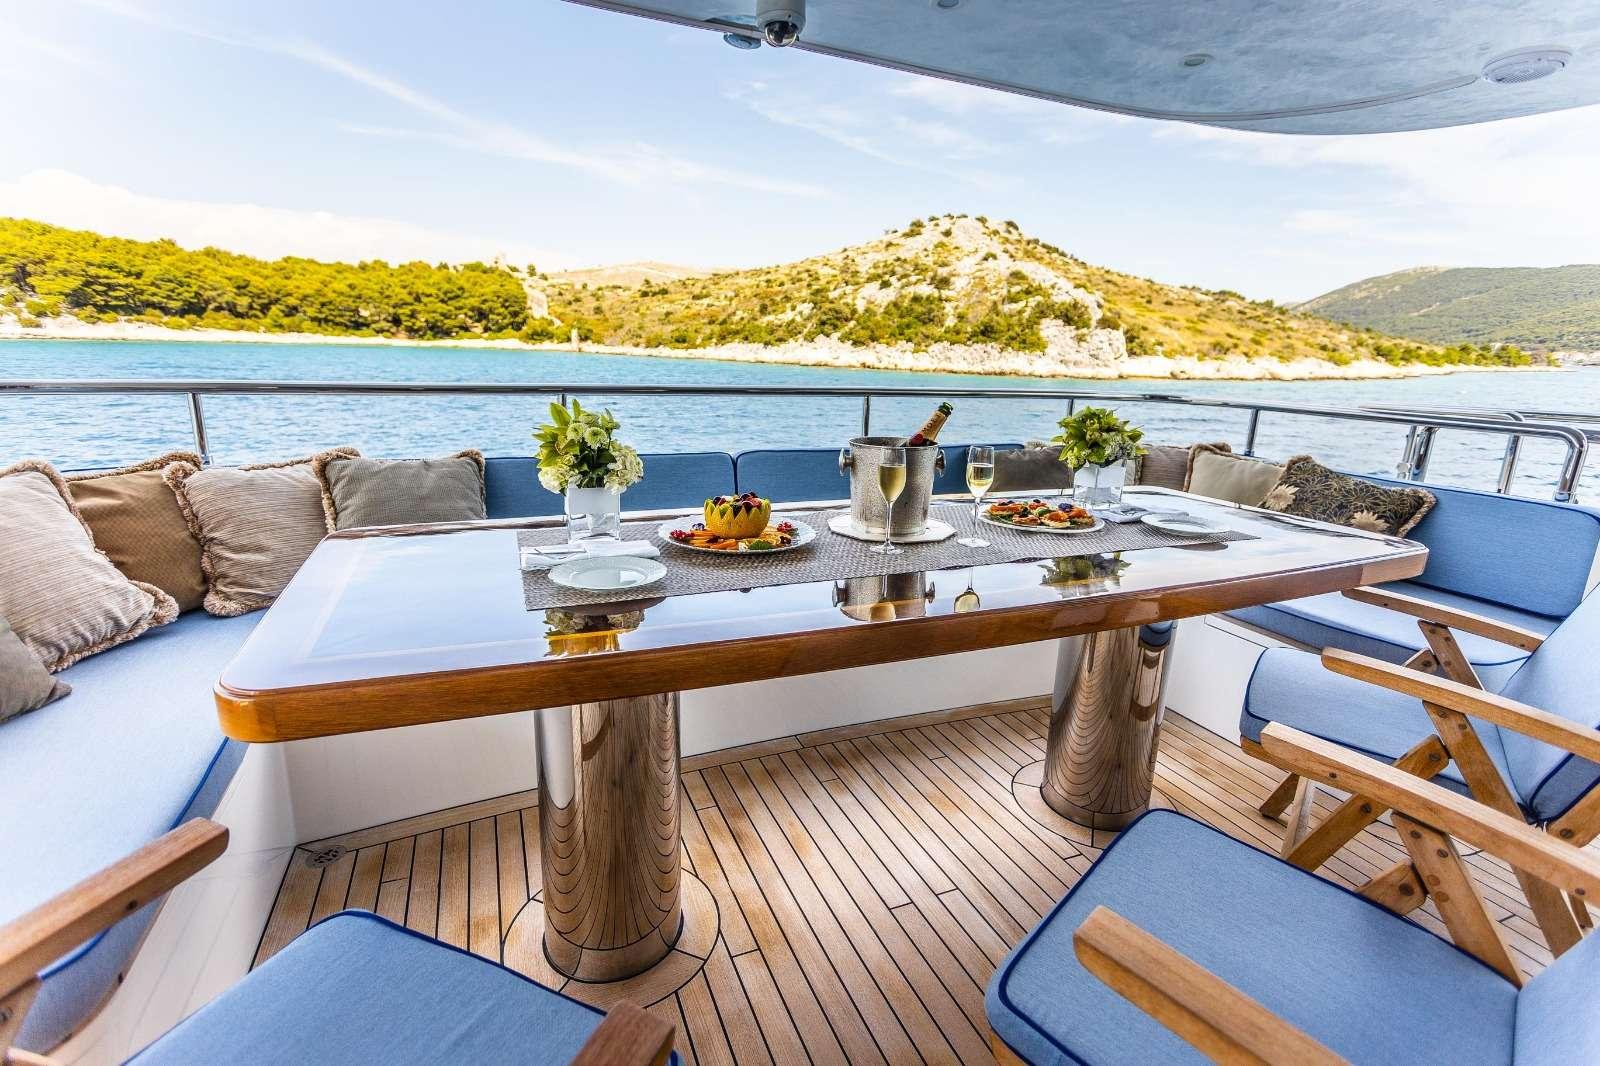 Image of MilaYa yacht #9